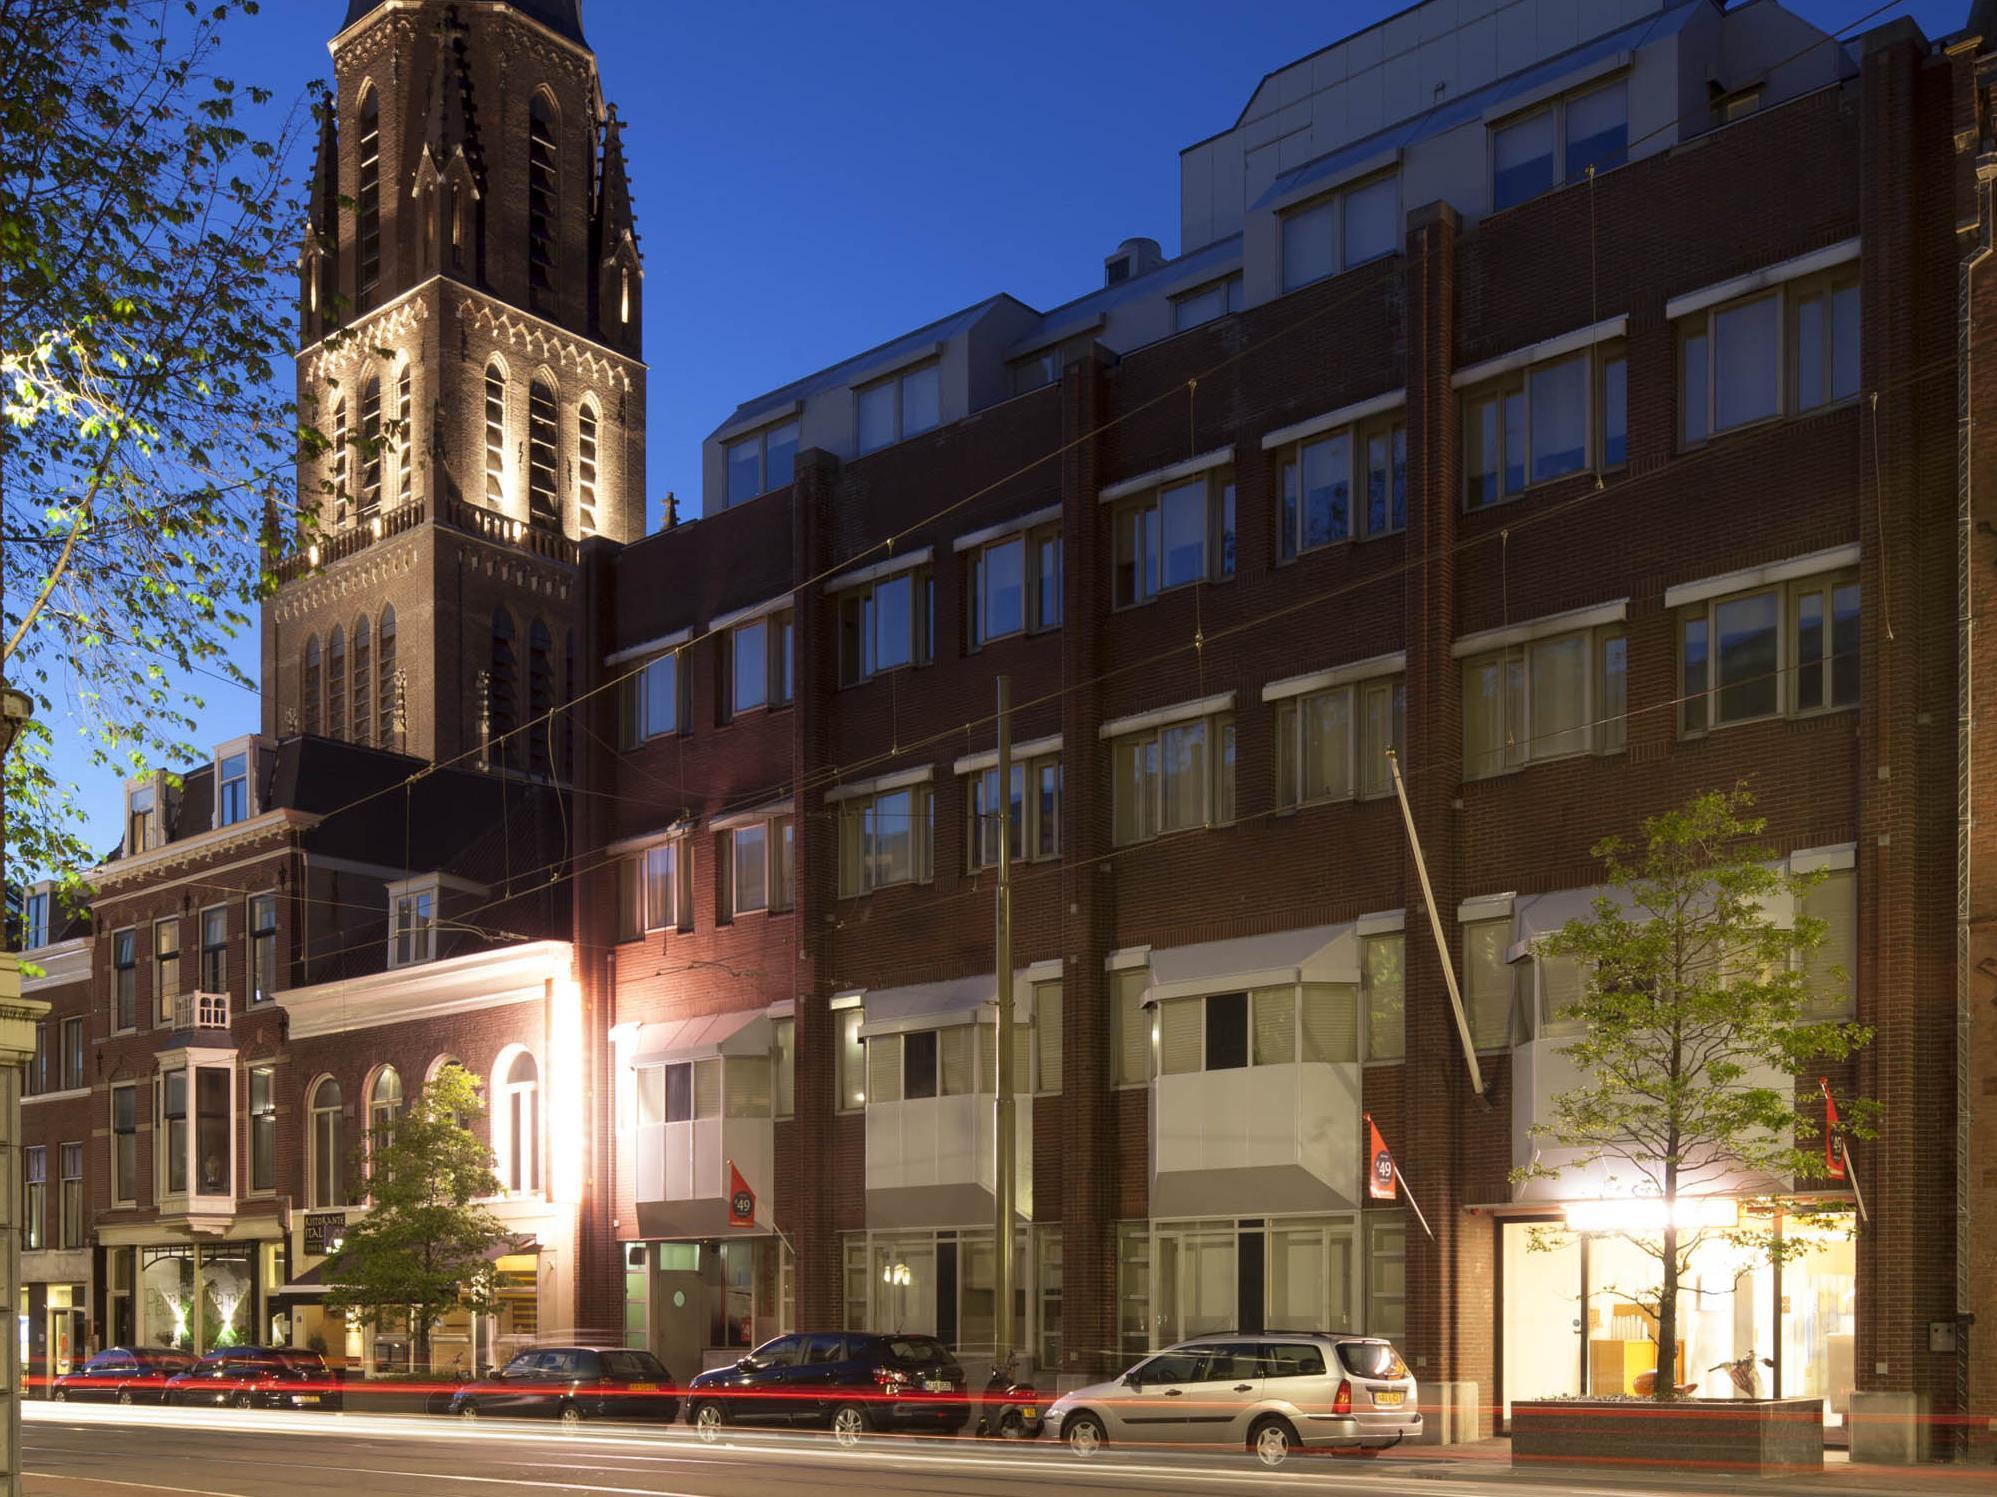 easyHotel The Hague, Den Haag